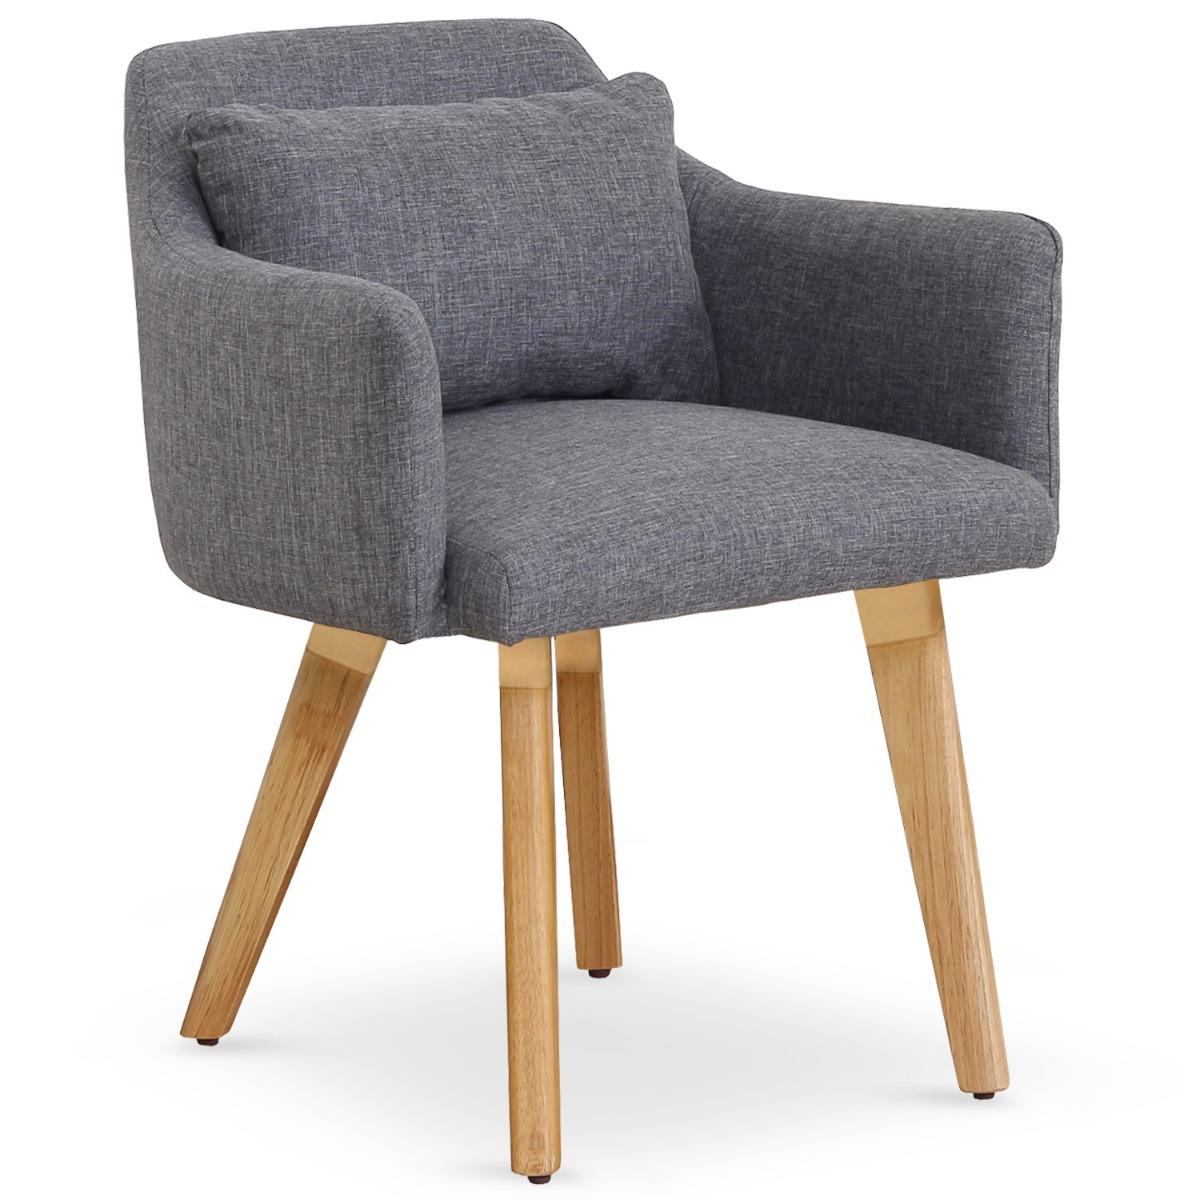 Lot de 20 chaises / fauteuils scandinaves Gybson Tissu Gris clair